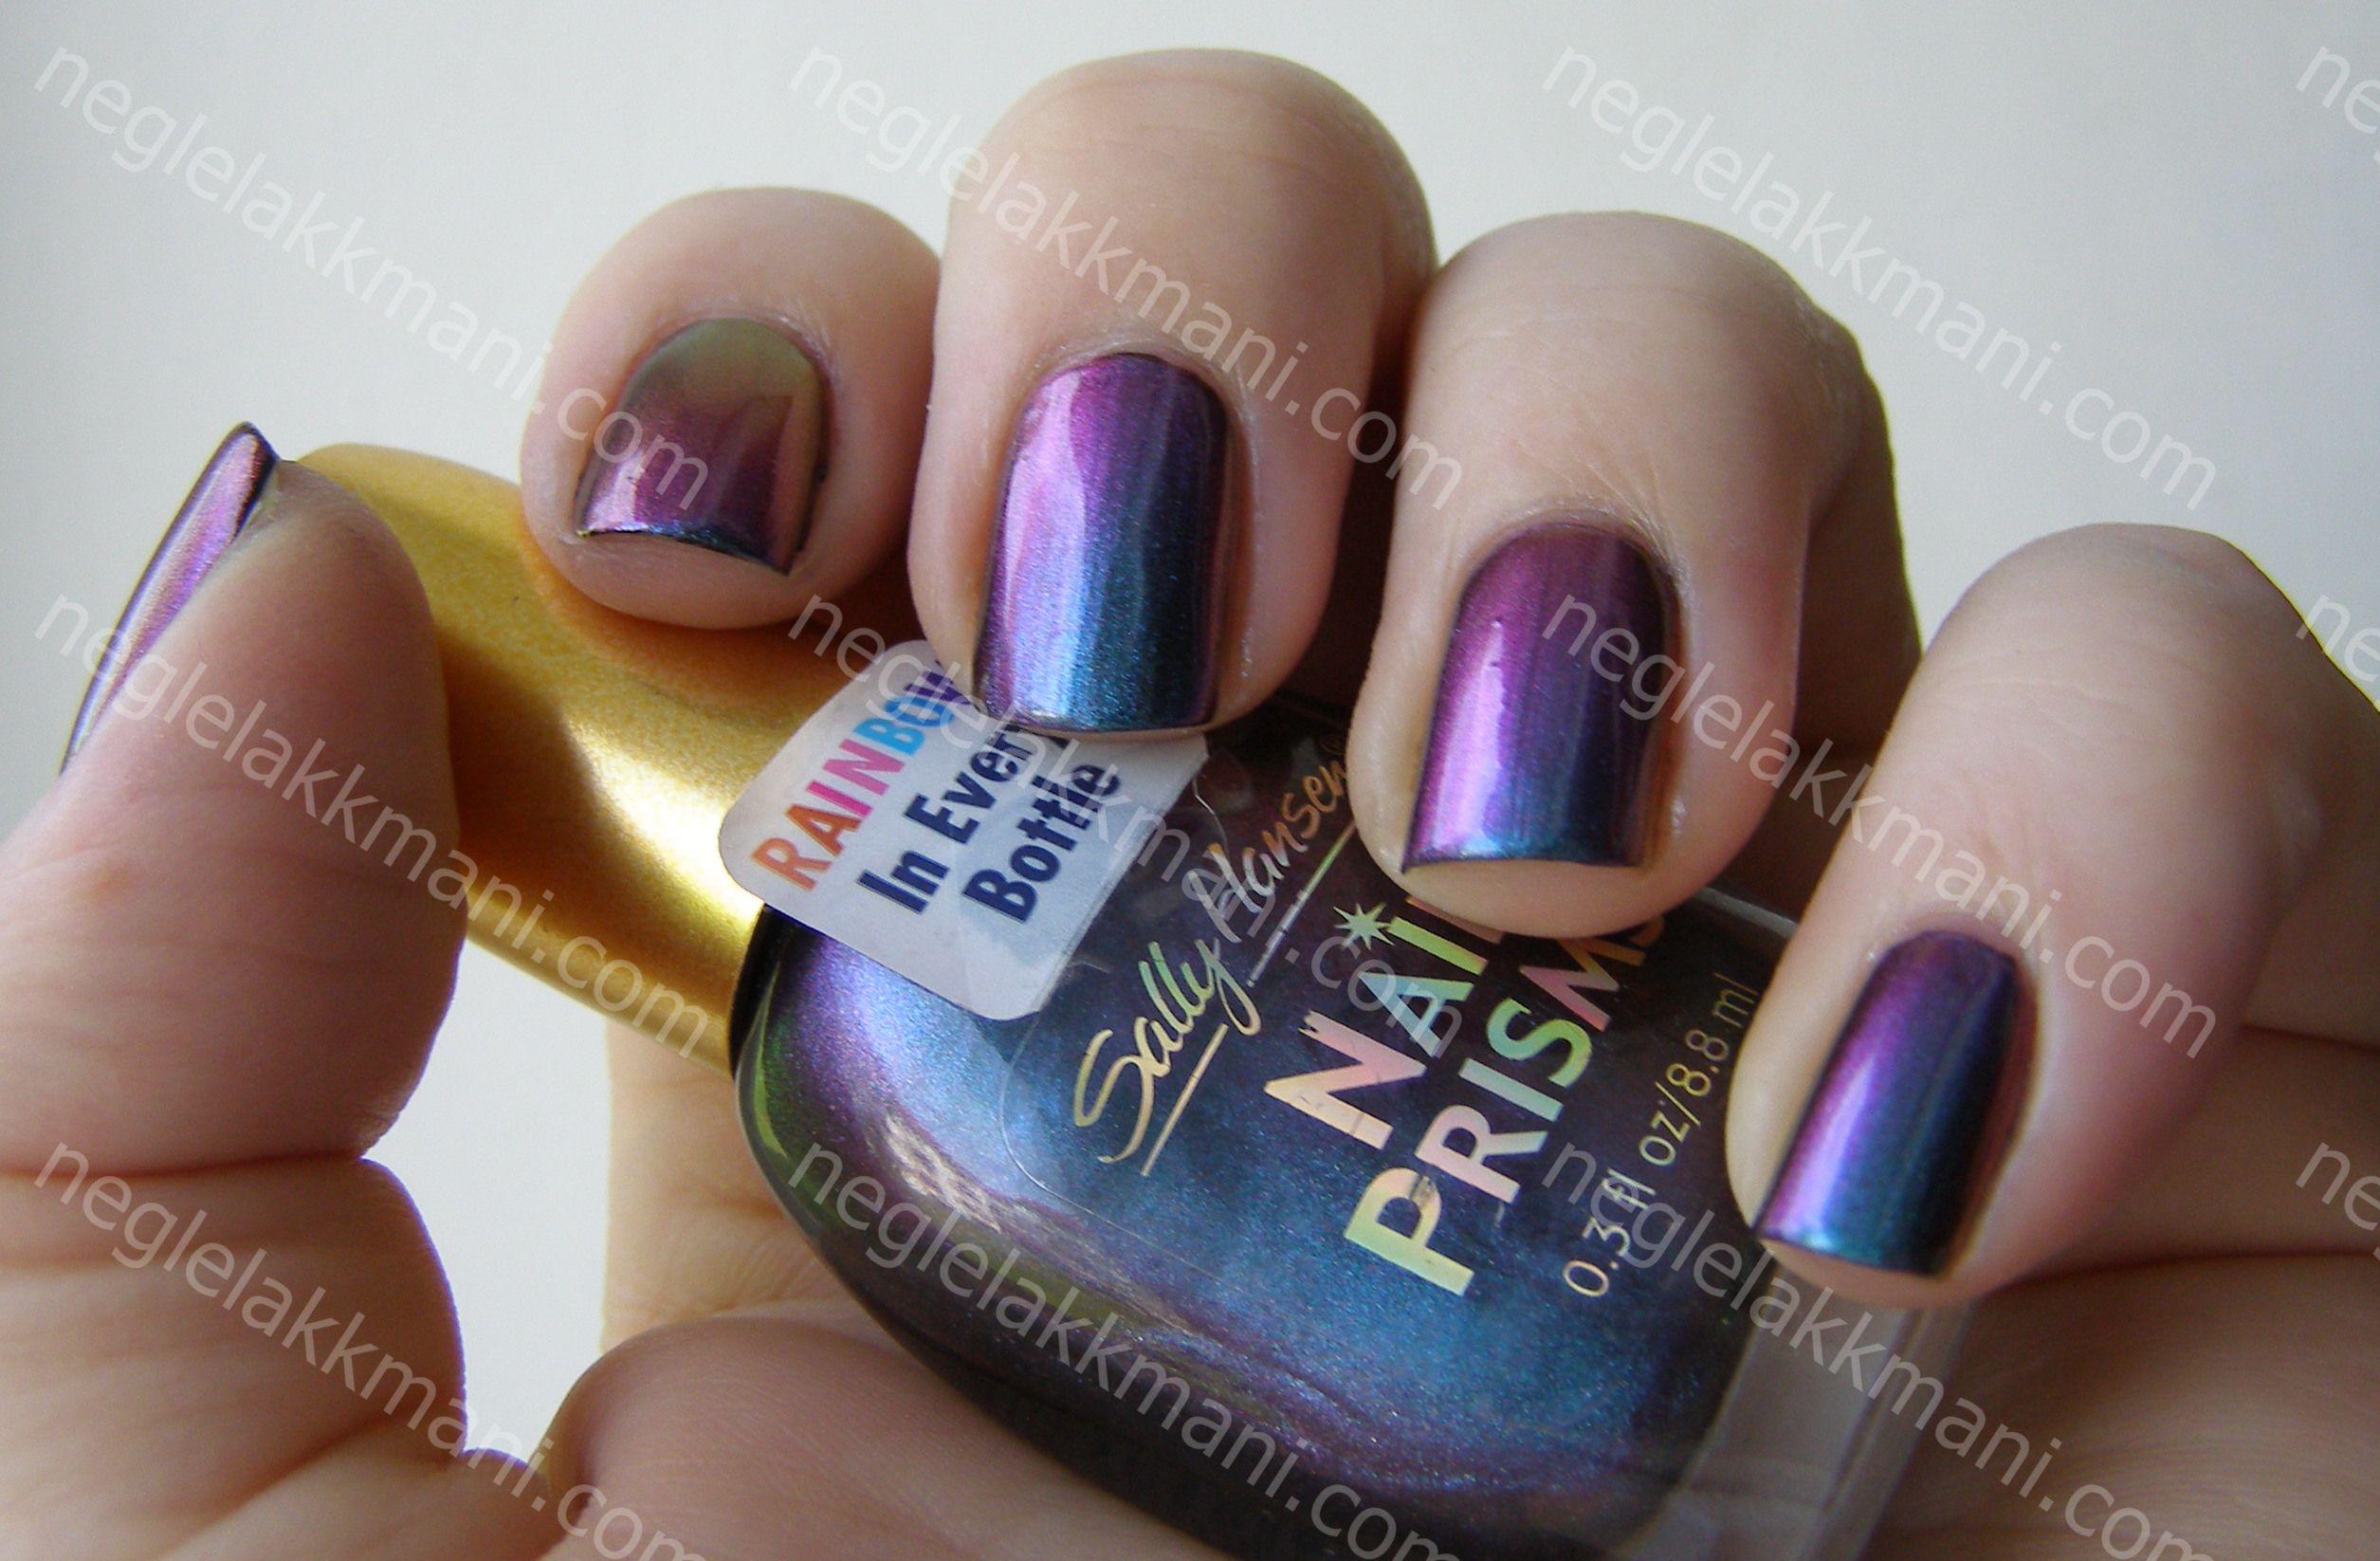 Sally Hansen Turquoise Opal over black